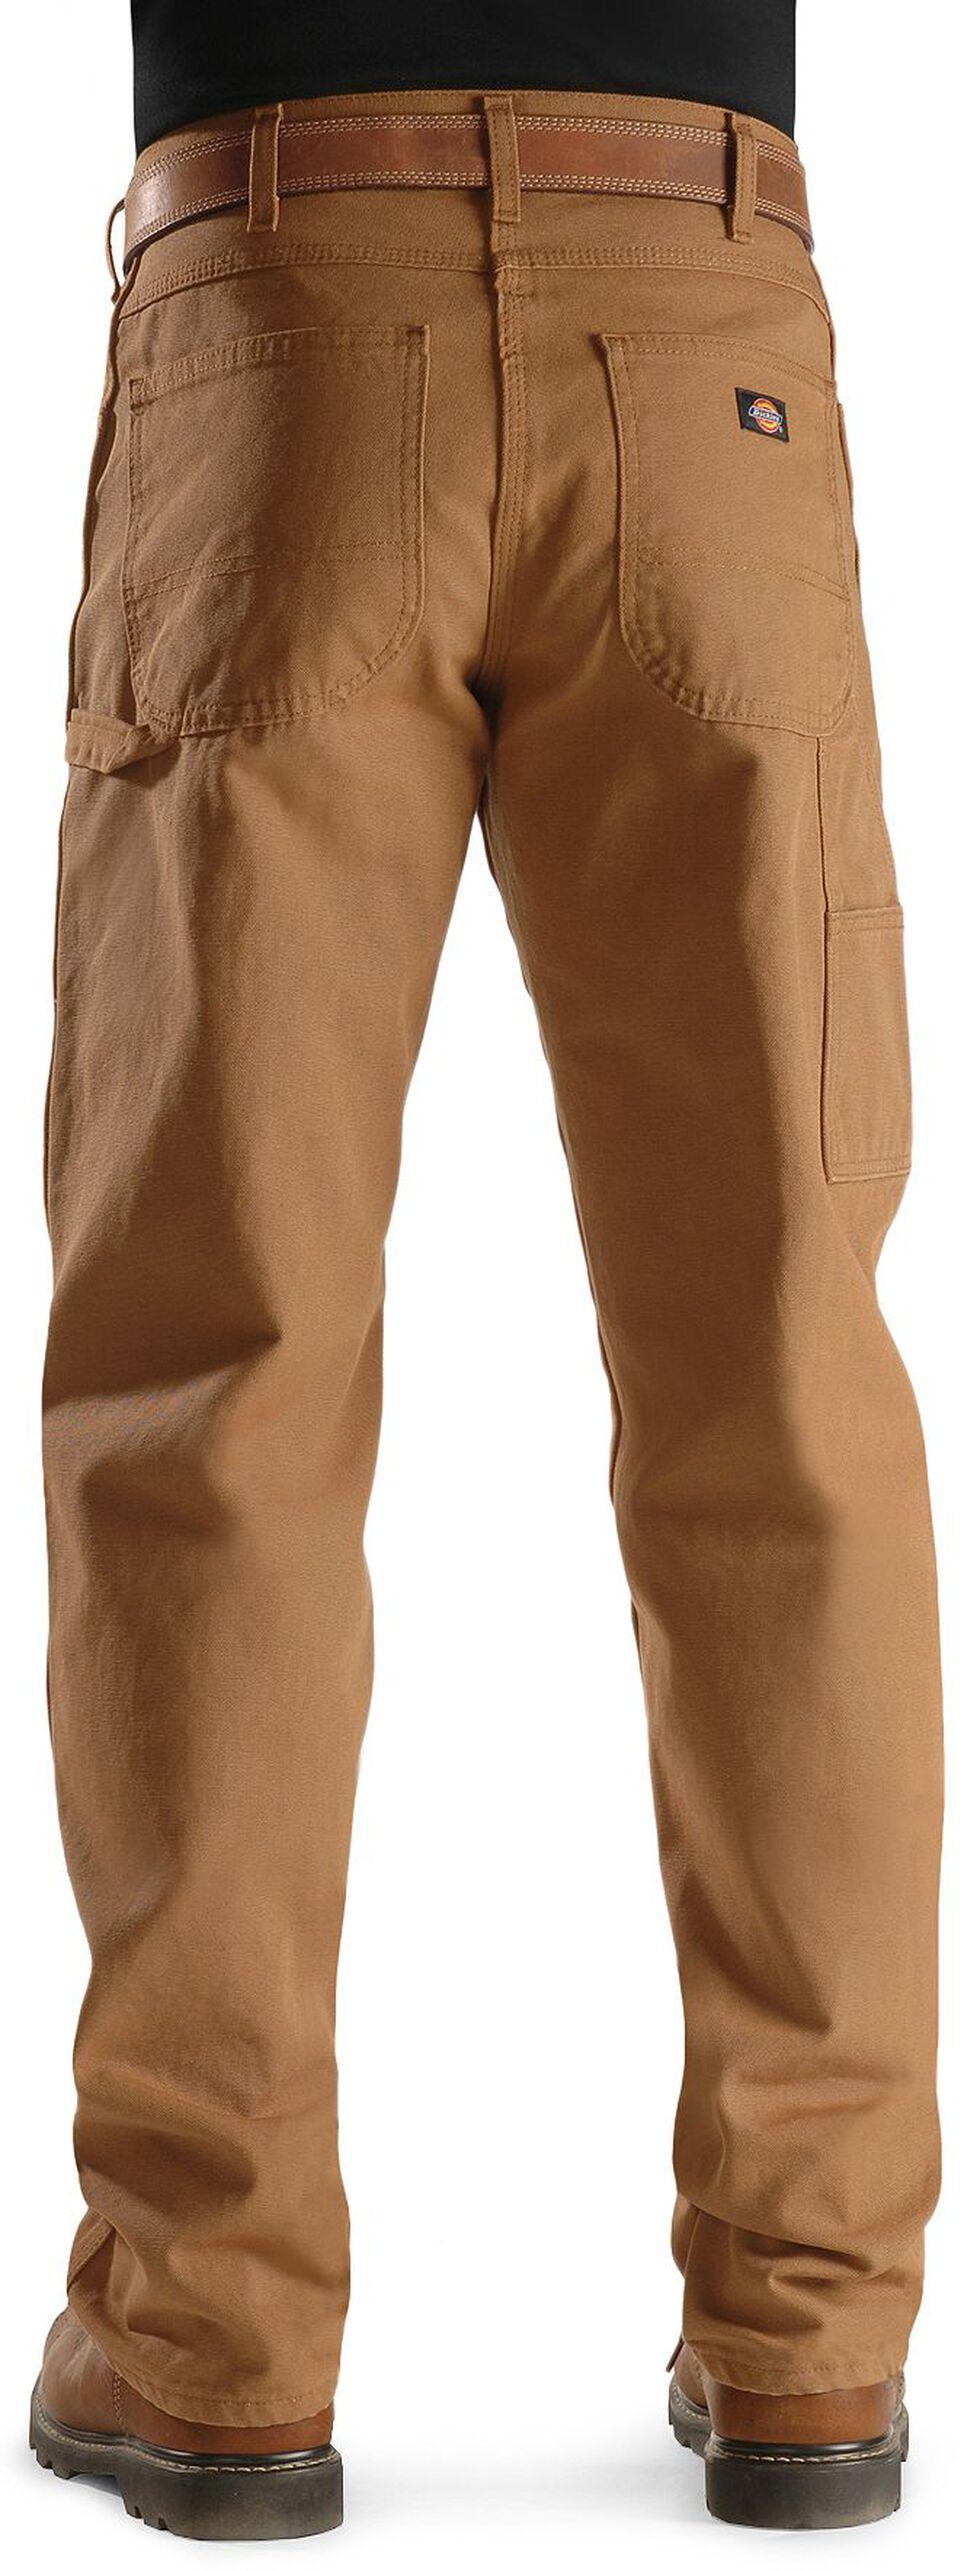 Dickies Duck Twill Work Pants - Big & Tall, Brown Duck, hi-res